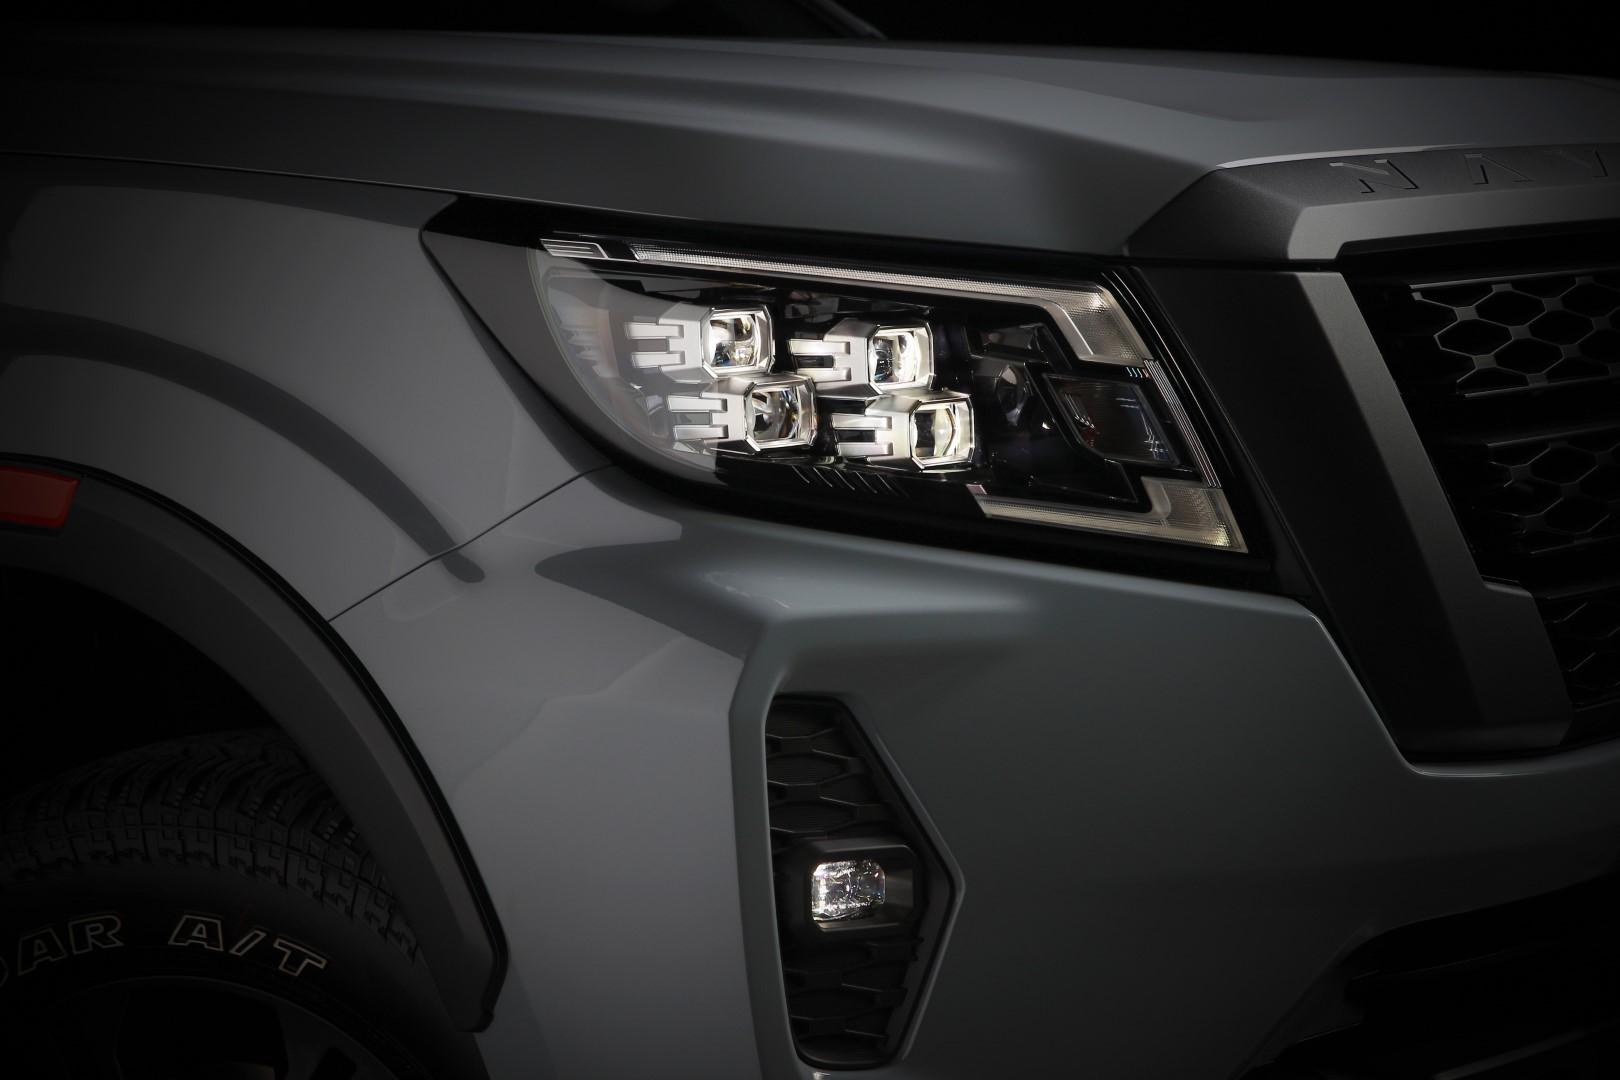 2020 nissan navara headlights